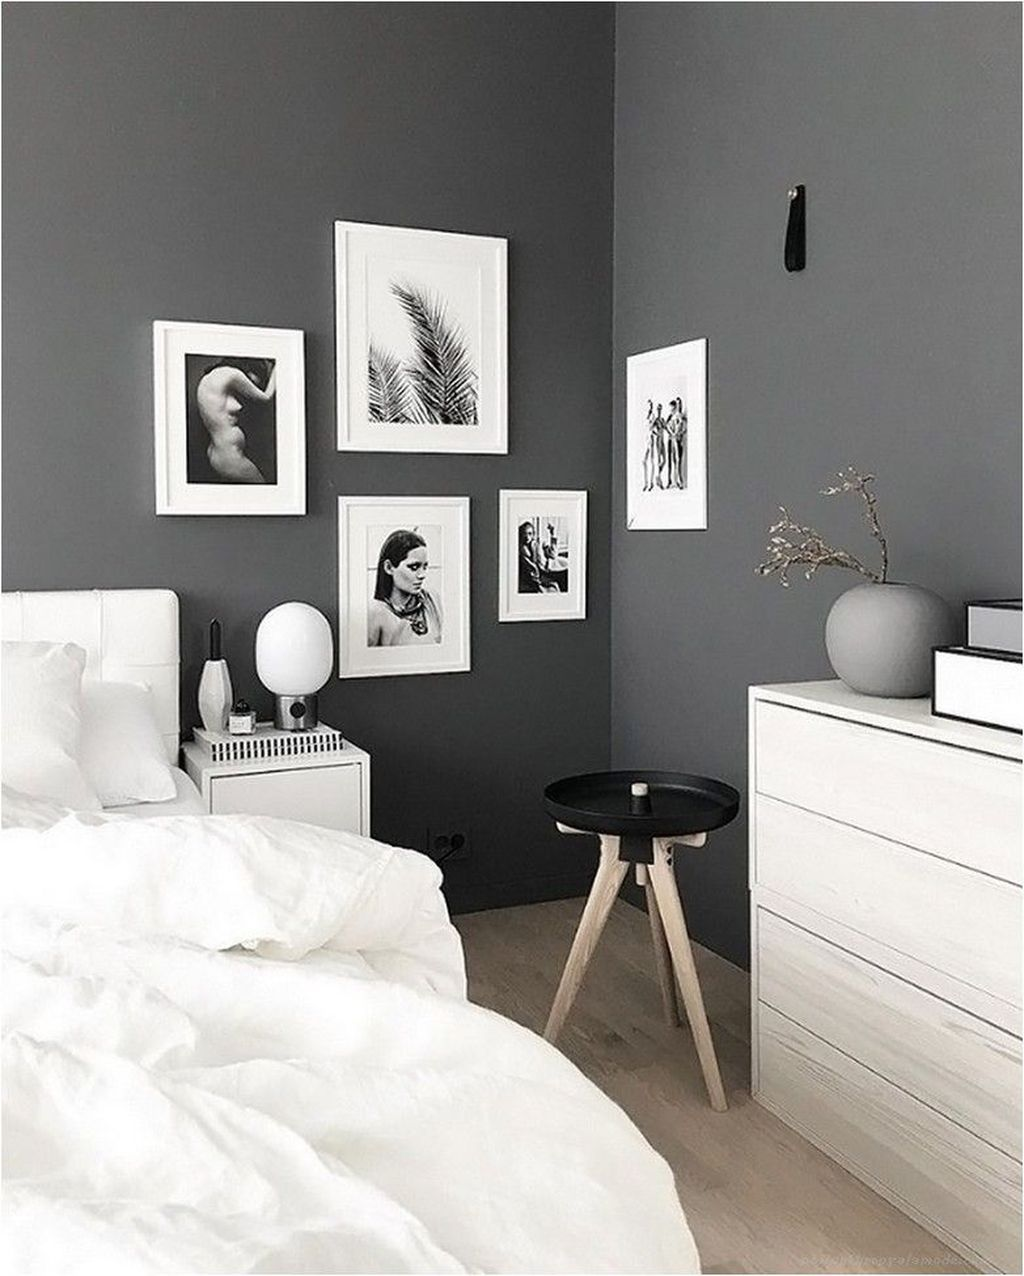 Latest bedroom interior design trends  elegant and minimalist master bedroom design trends ideas